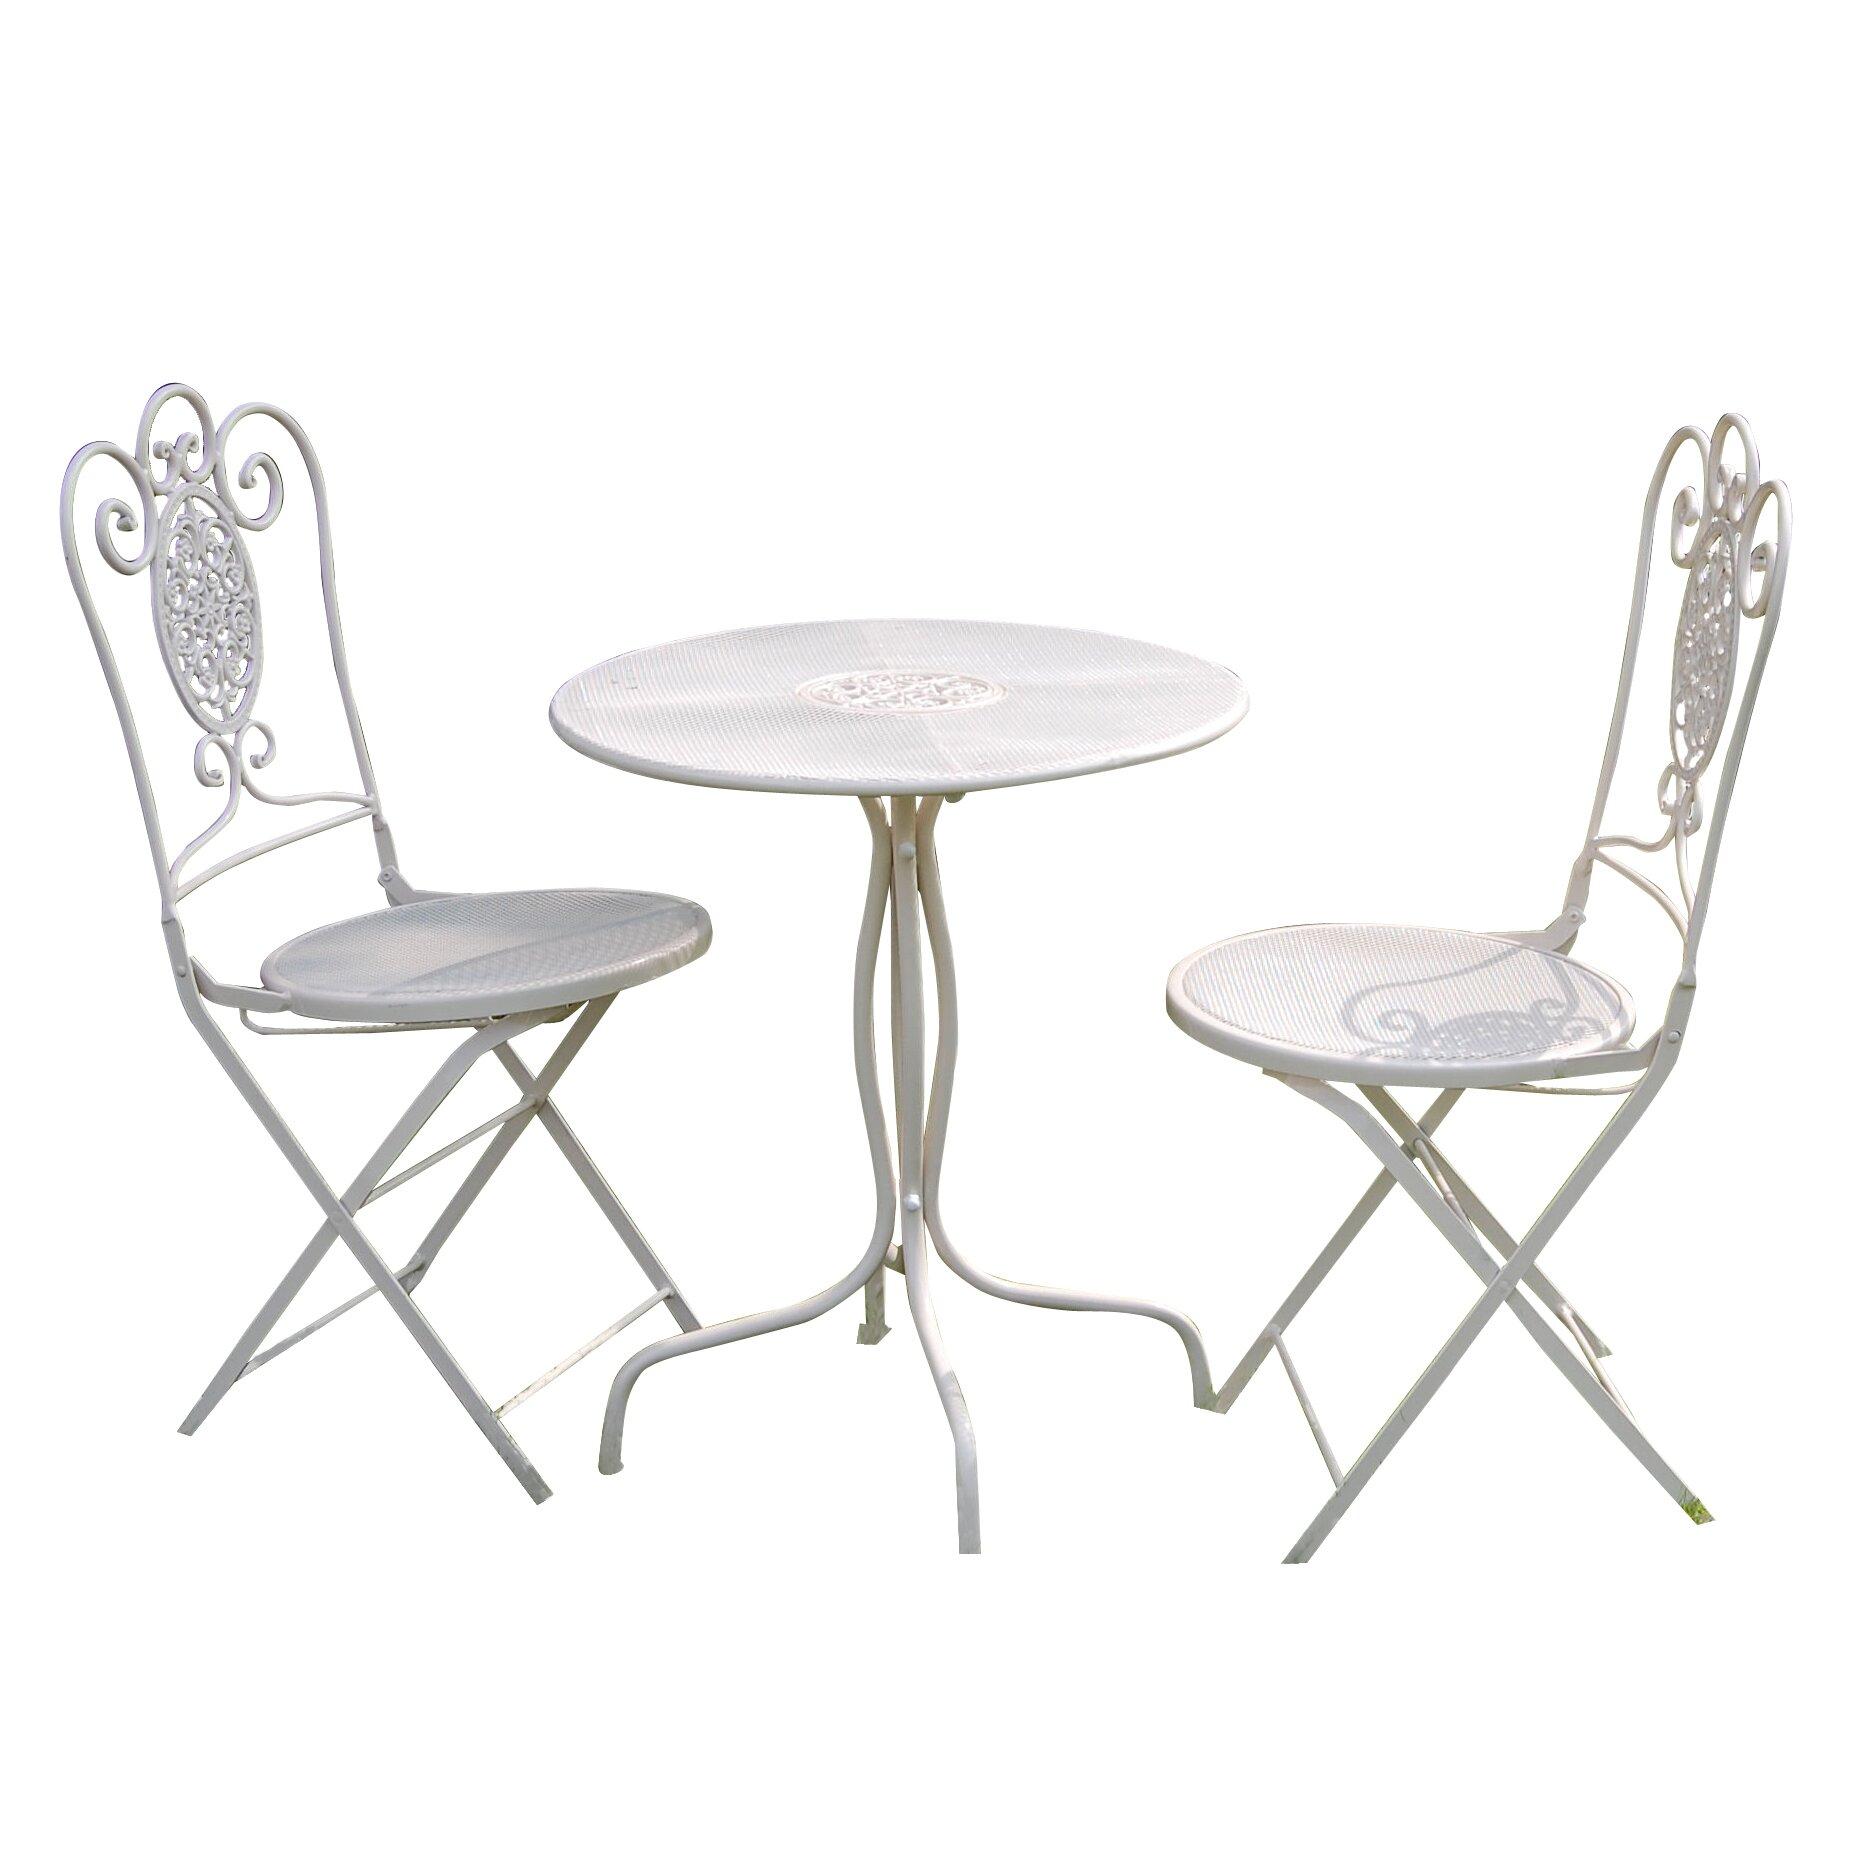 ascalon 2 sitzer bistro set napoli bewertungen. Black Bedroom Furniture Sets. Home Design Ideas